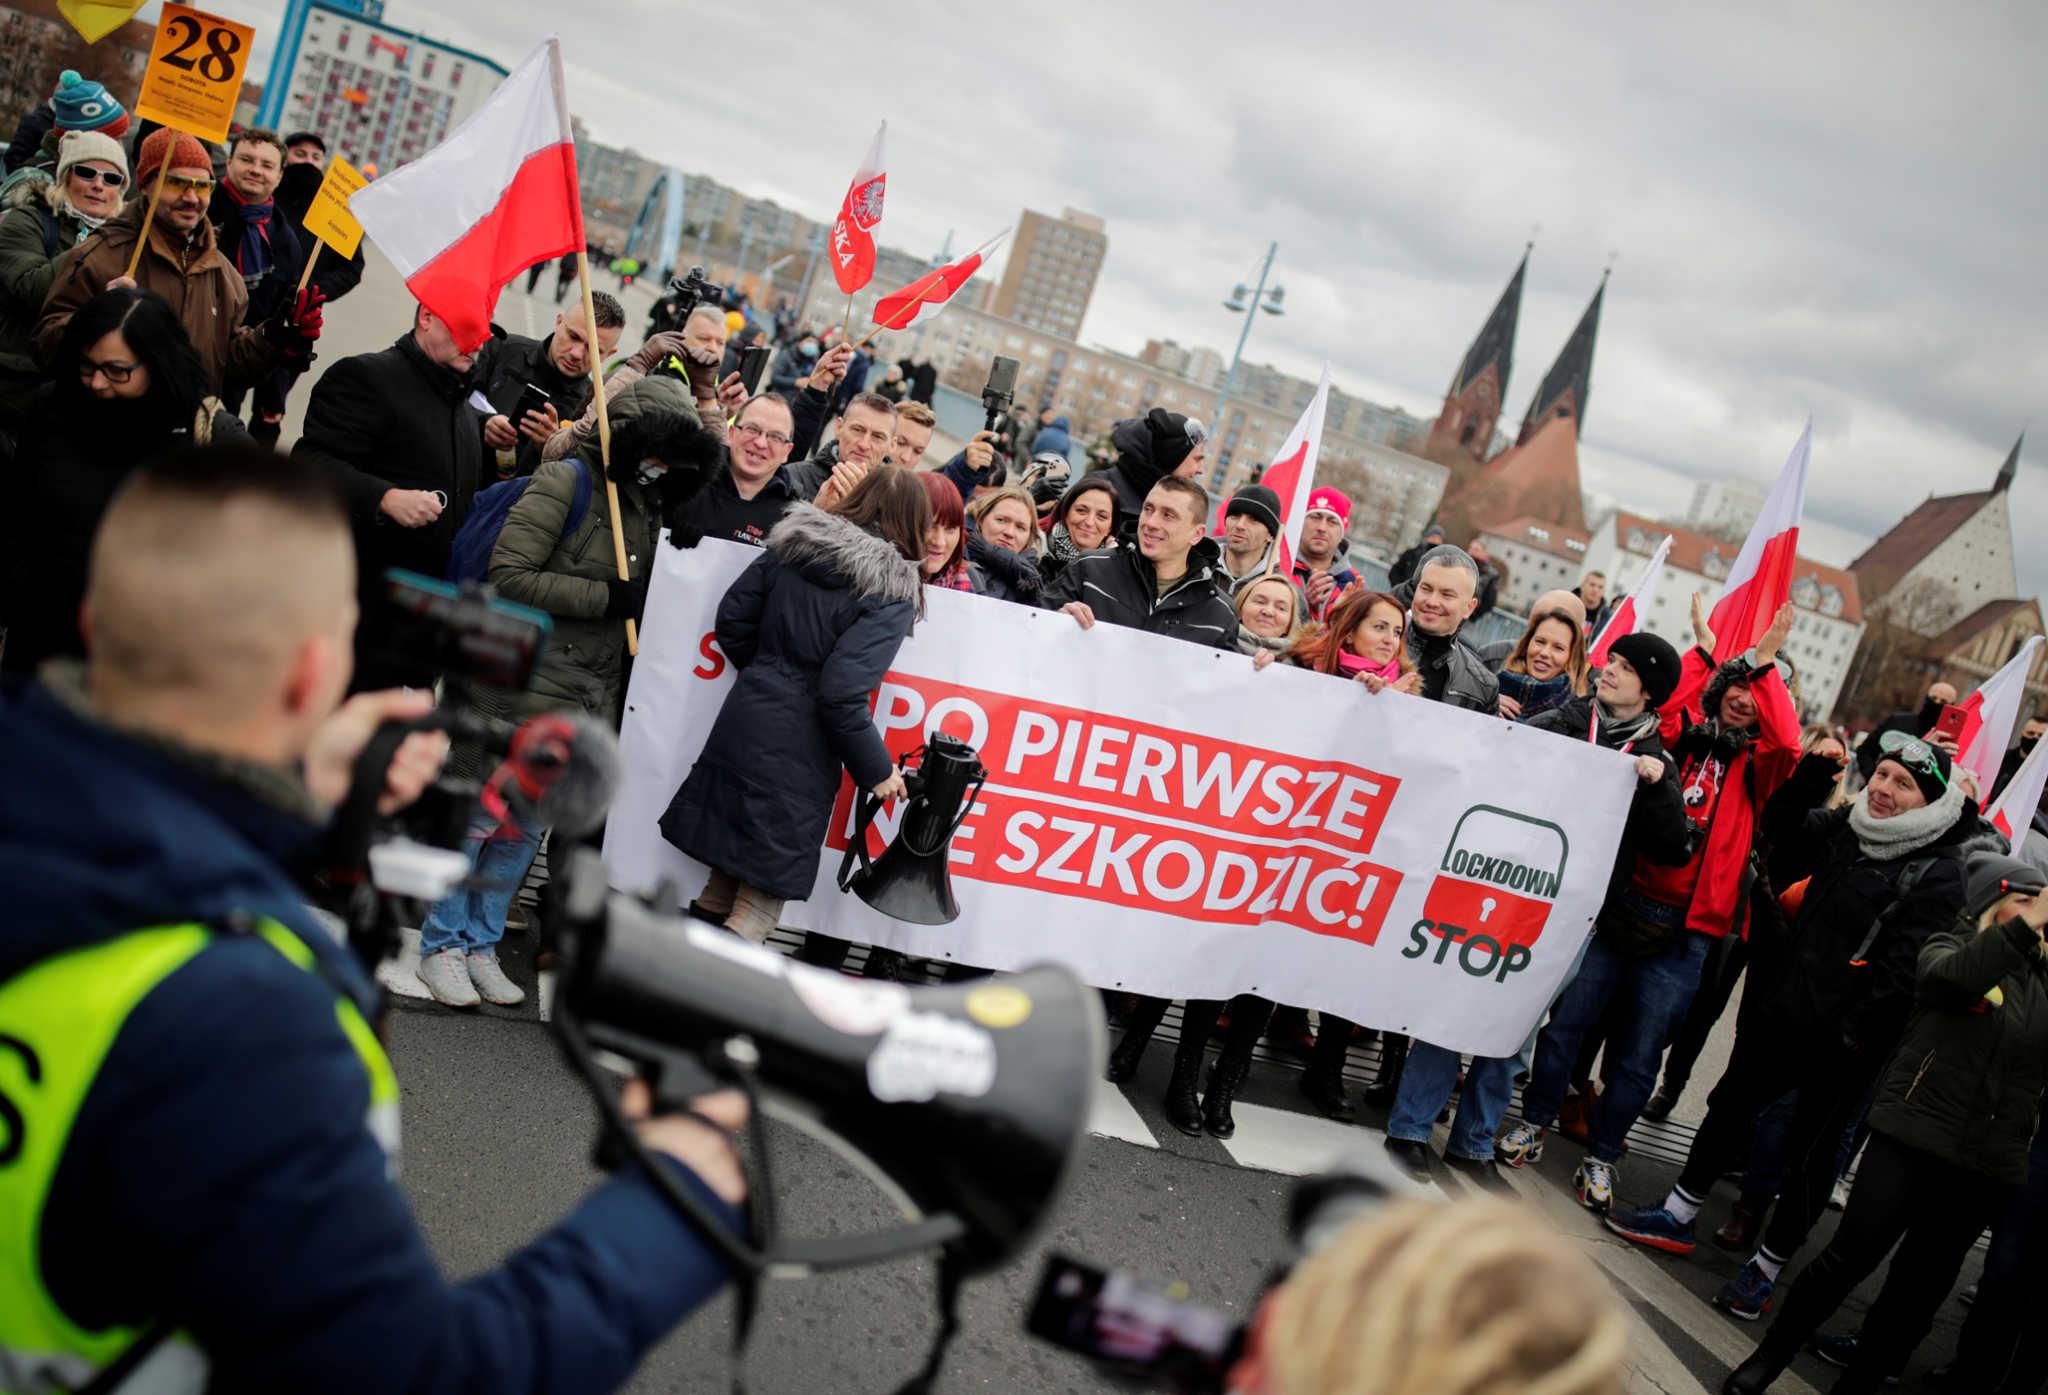 Coronavirus skeptics protest against government restrictions, amid the coronavirus disease (COVID-19) outbreak at the border in Slubice, Poland, November 28, 2020. REUTERS/Hannibal Hanschke